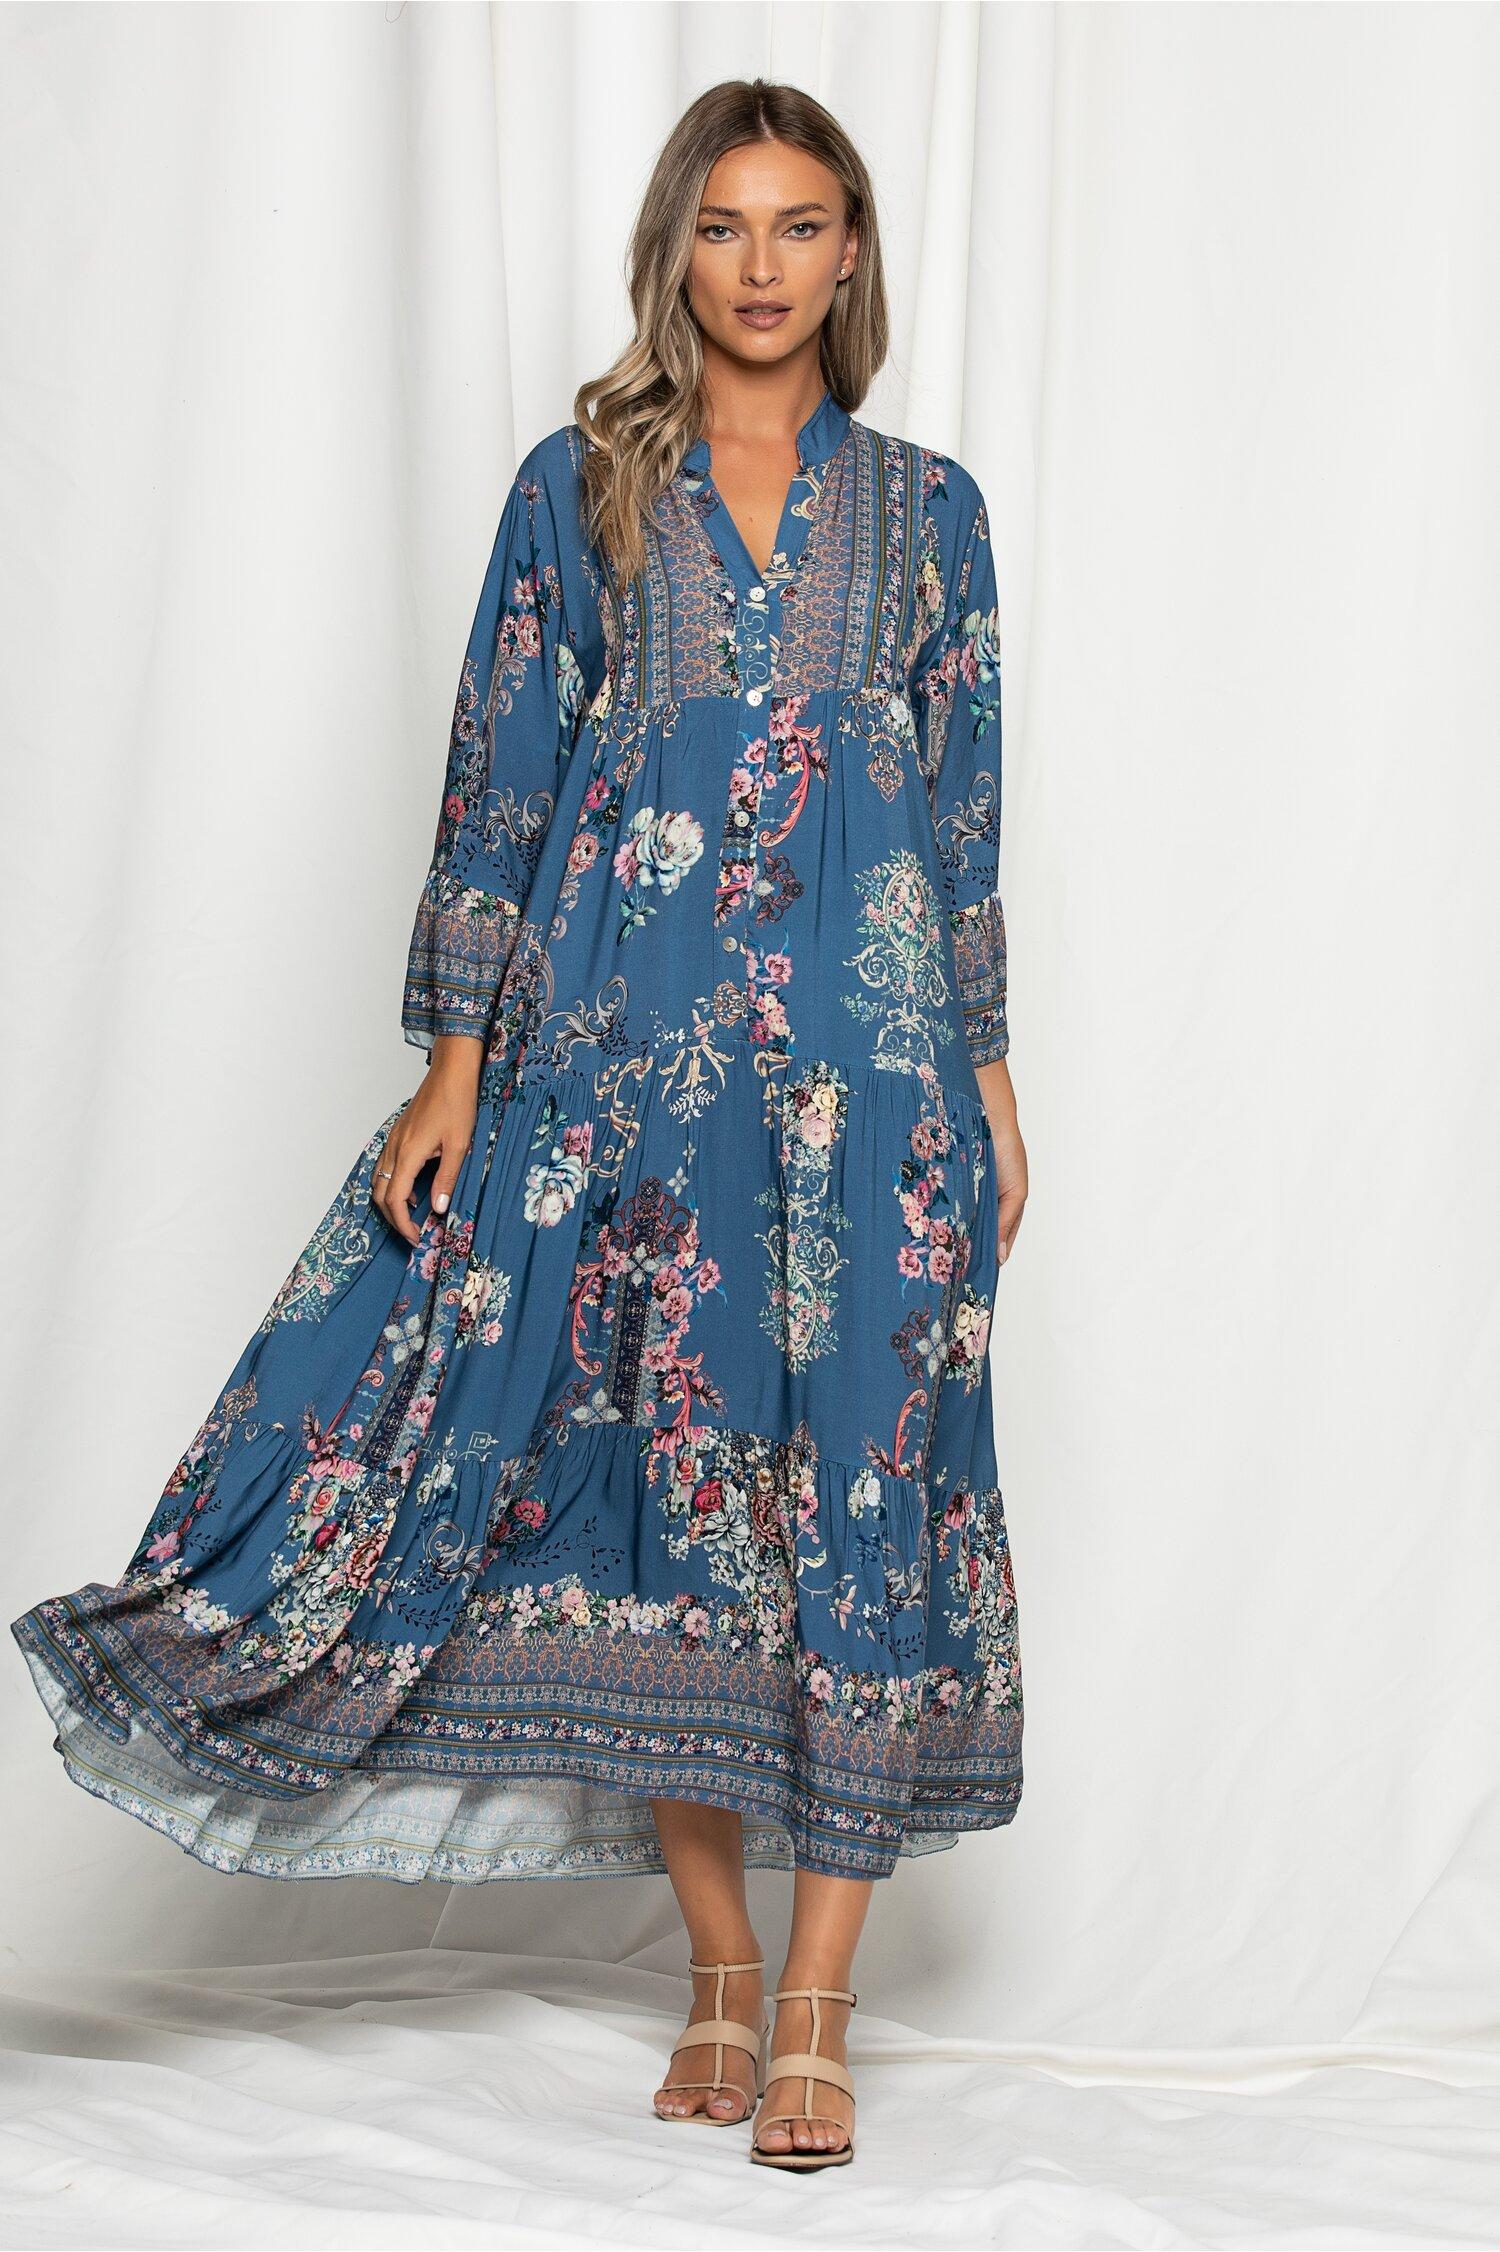 Rochie Aly albastra lejera cu imprimeu floral pastelat si maneci trei sferturi